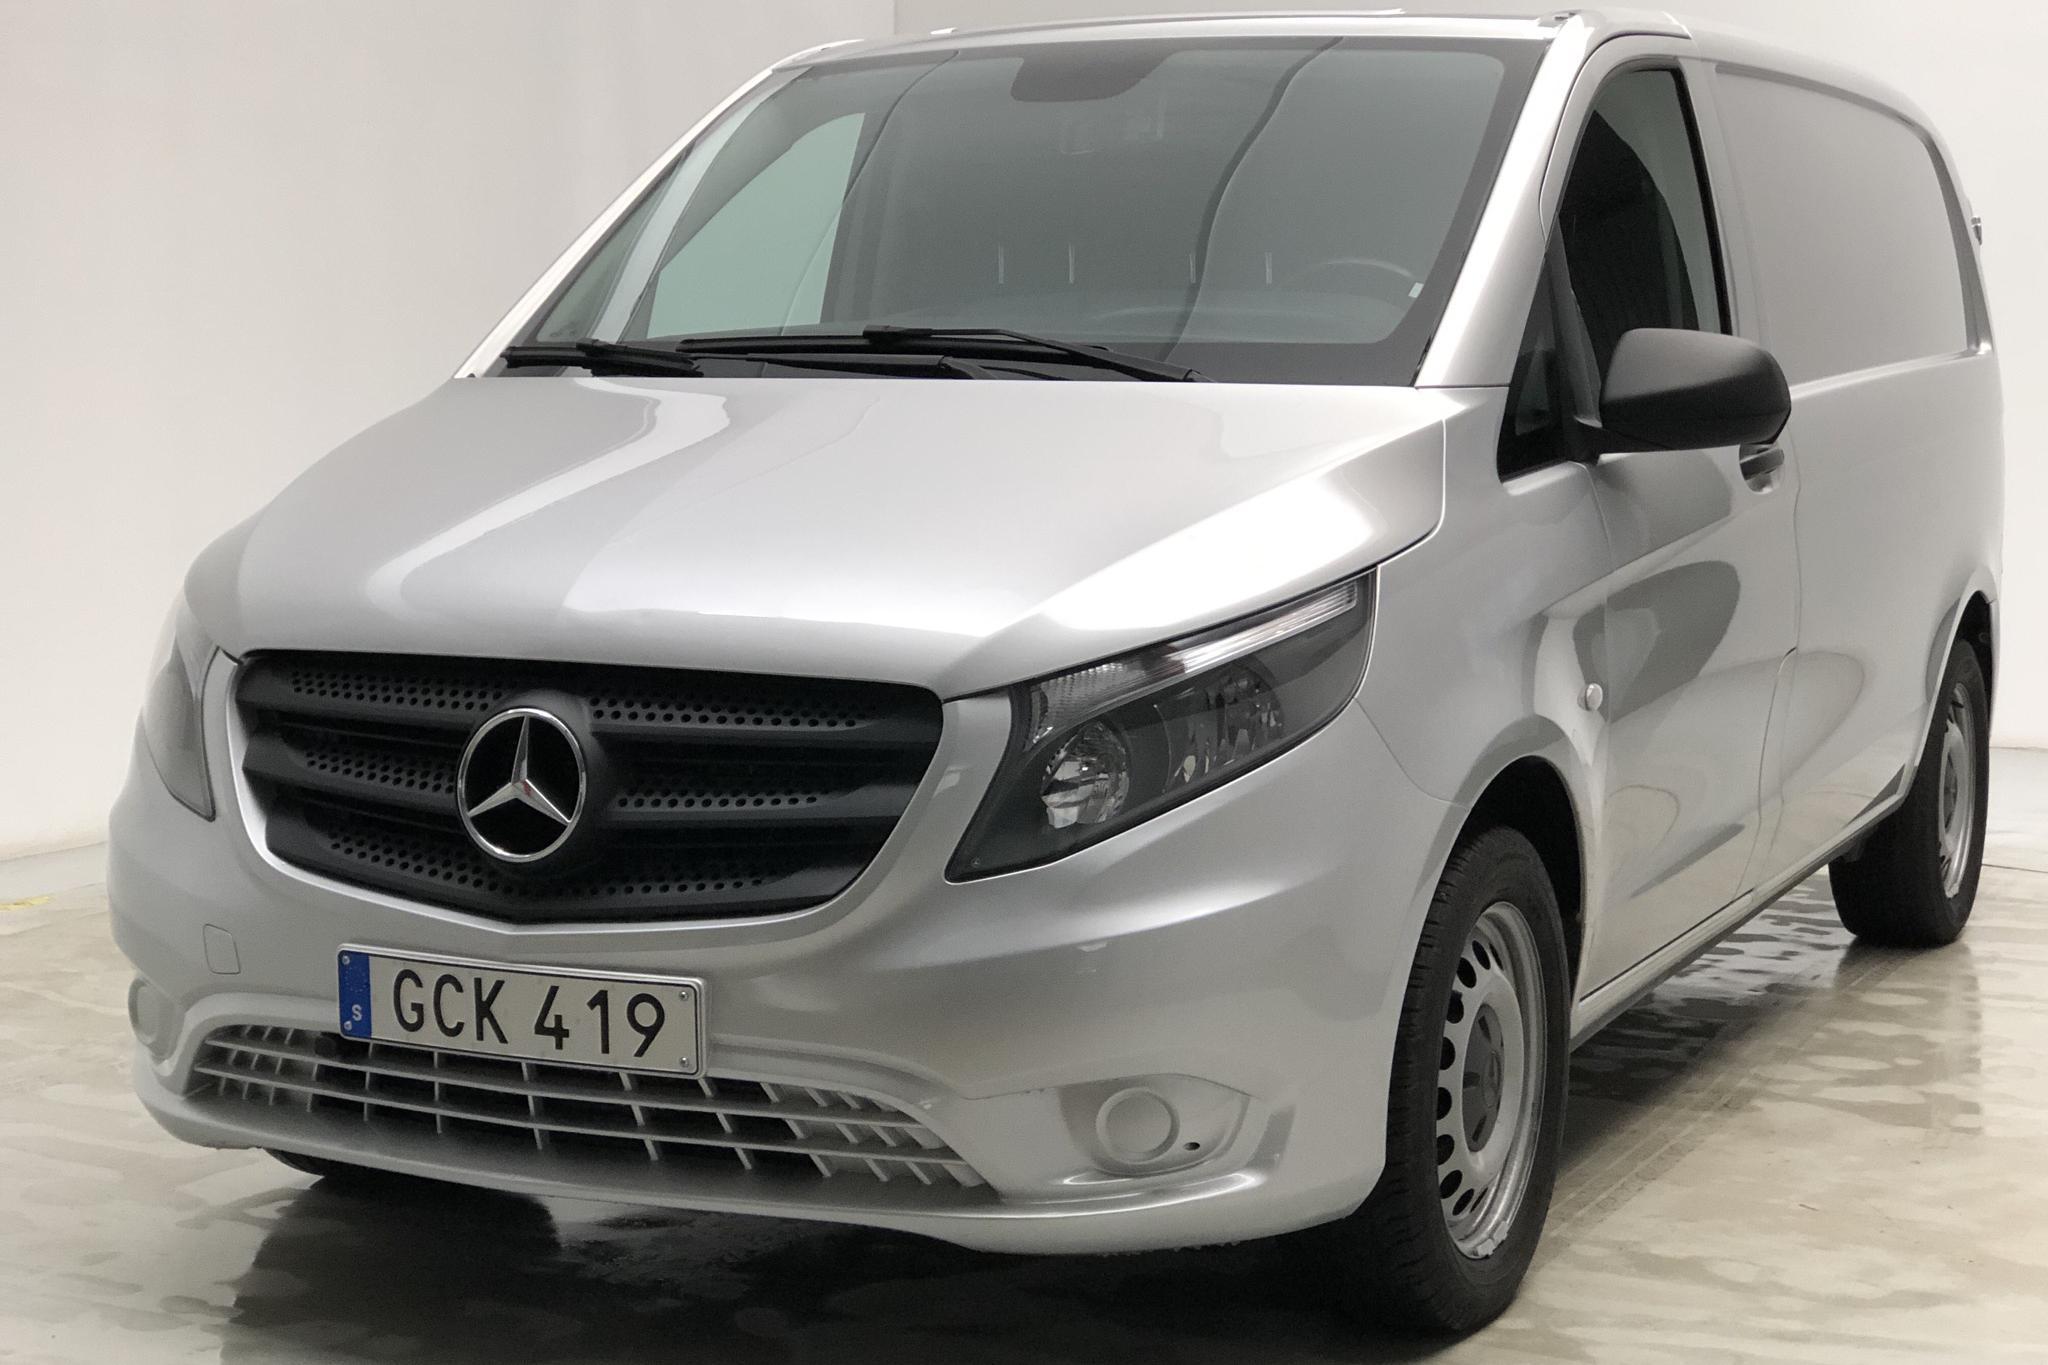 Mercedes Vito 119 BlueTEC 4x4 W640 (190hk) - 6 172 mil - Automat - silver - 2015